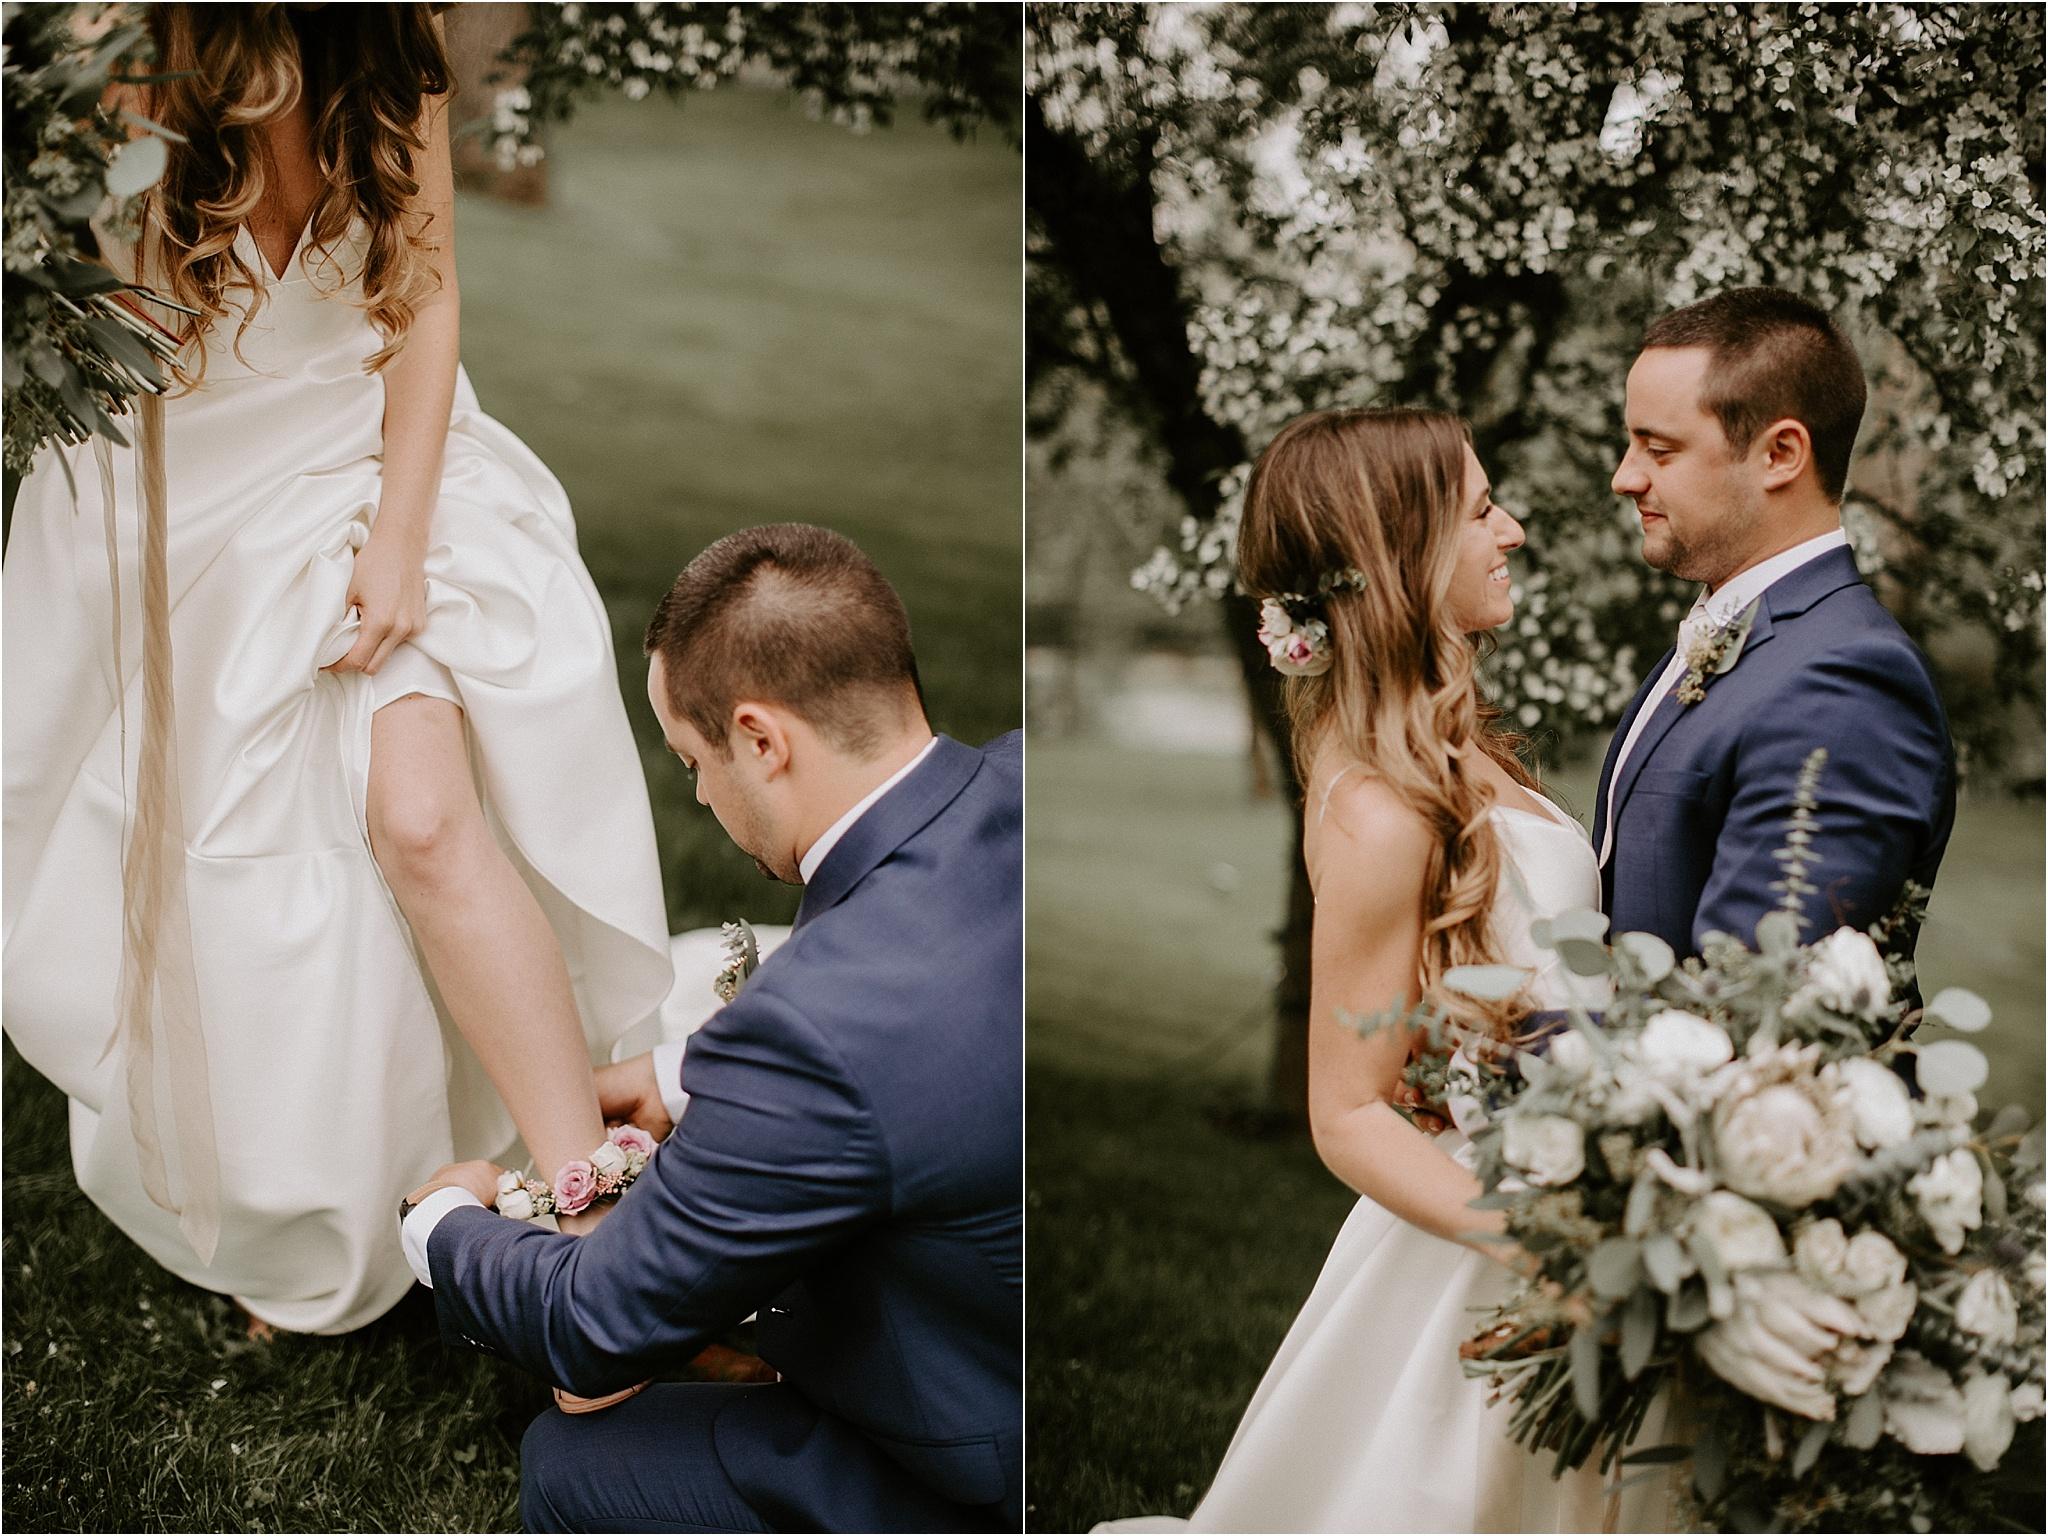 Sarah_Brookhart_Lancaster_PA_Wedding_Photographer_0025.jpg